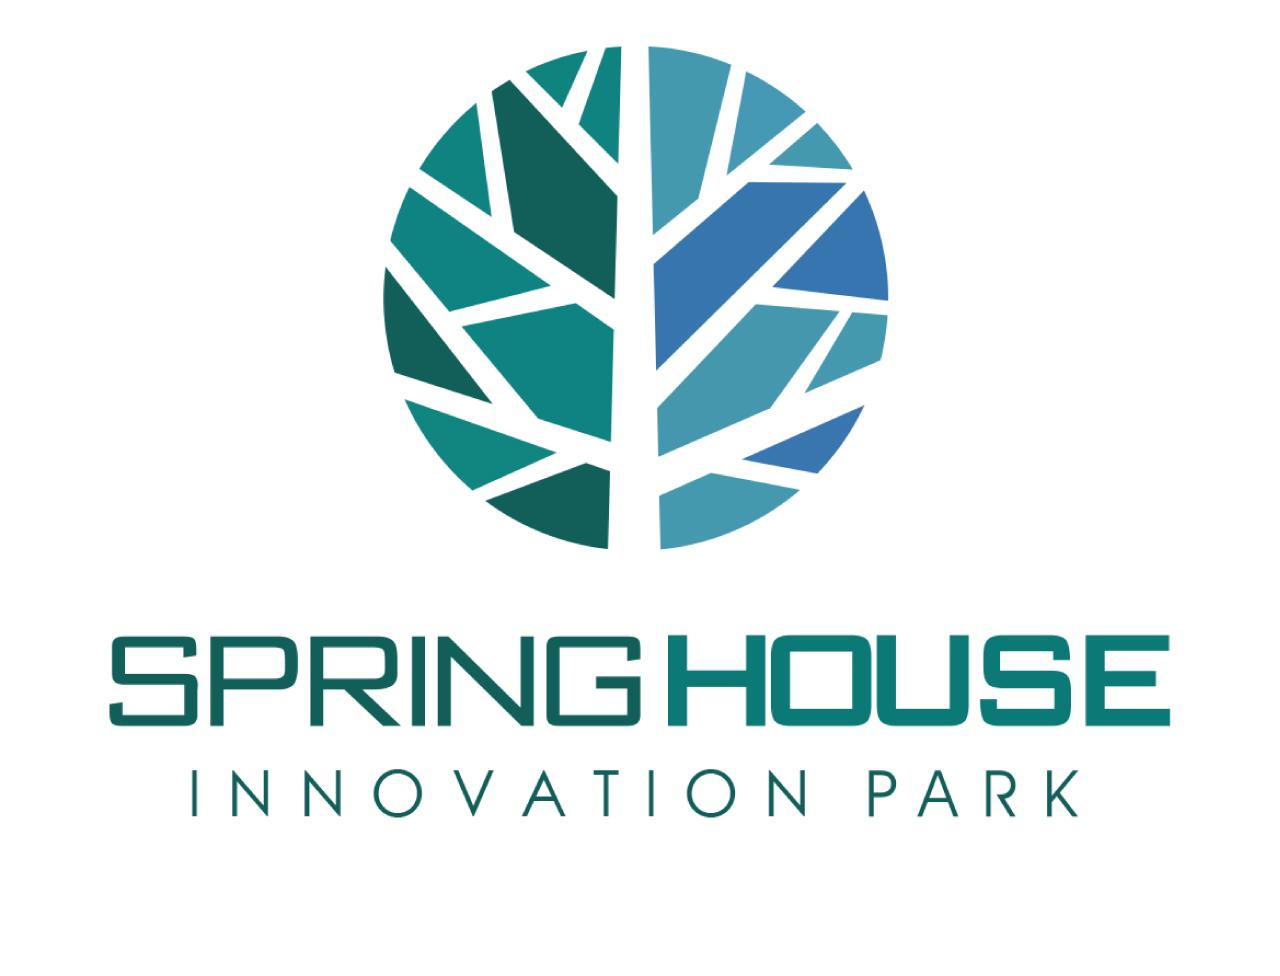 Spring House Innovation Park